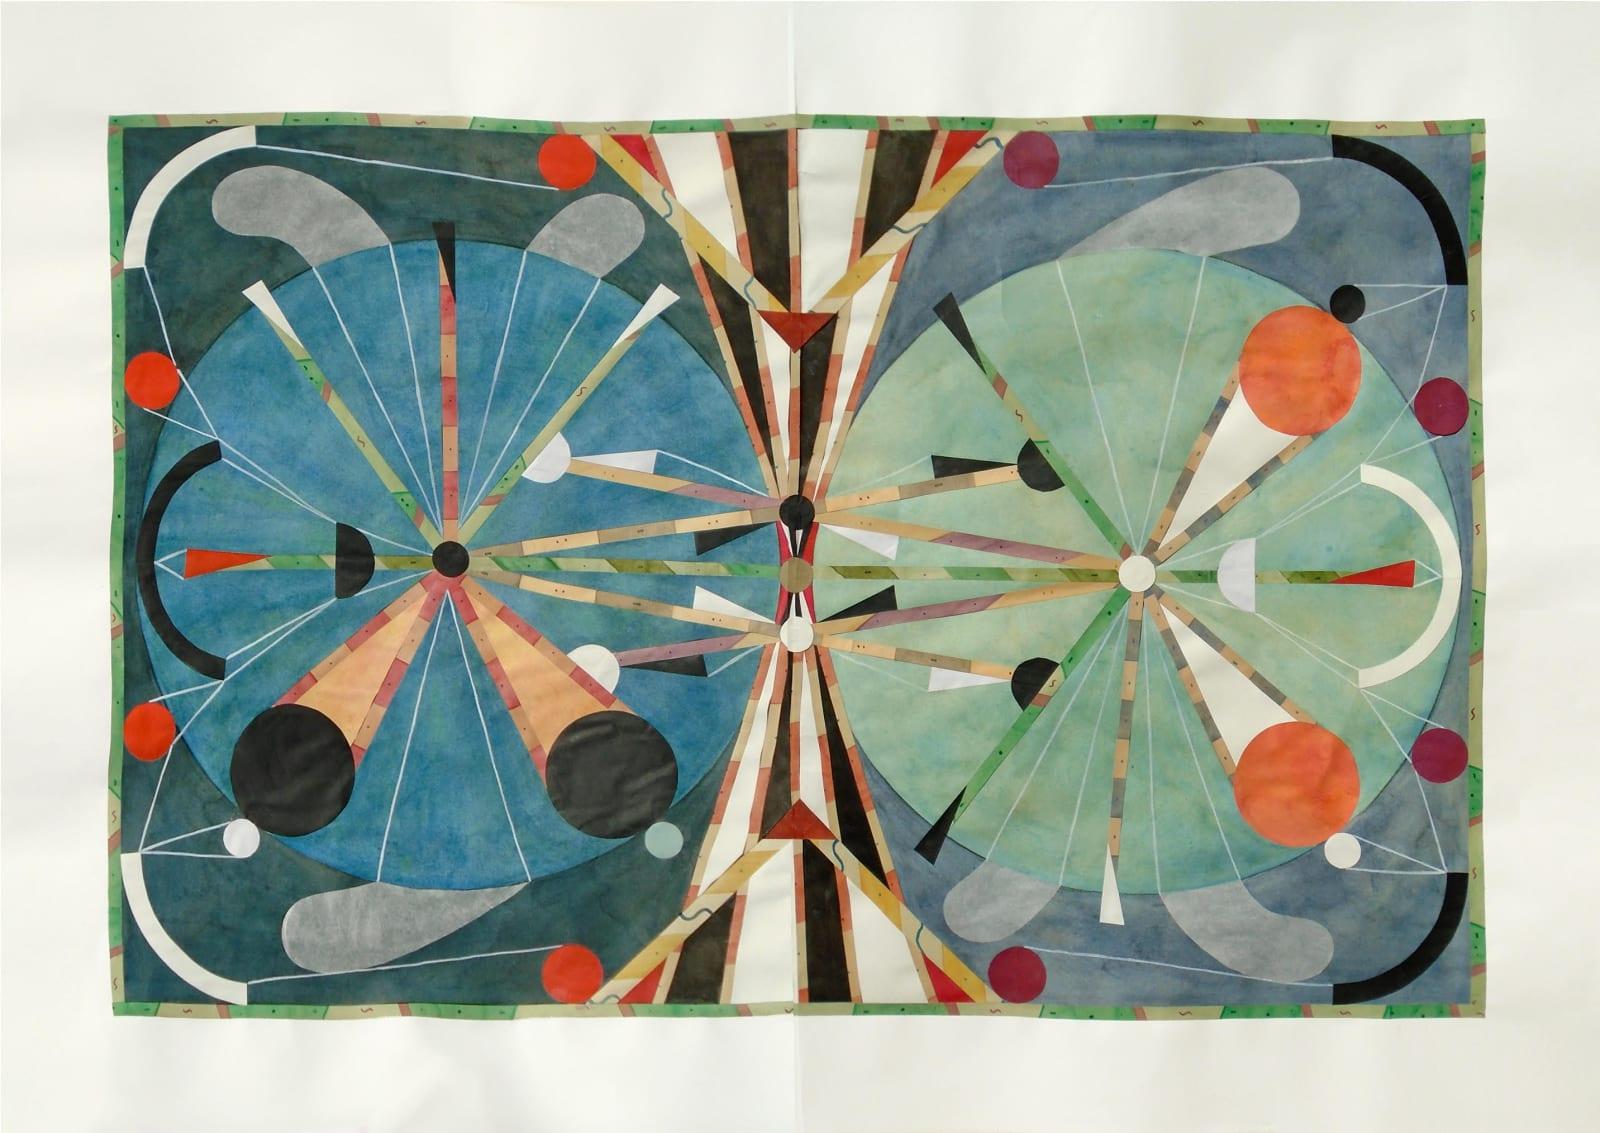 Rithika Merchant, Panorama III (Aether), 2021